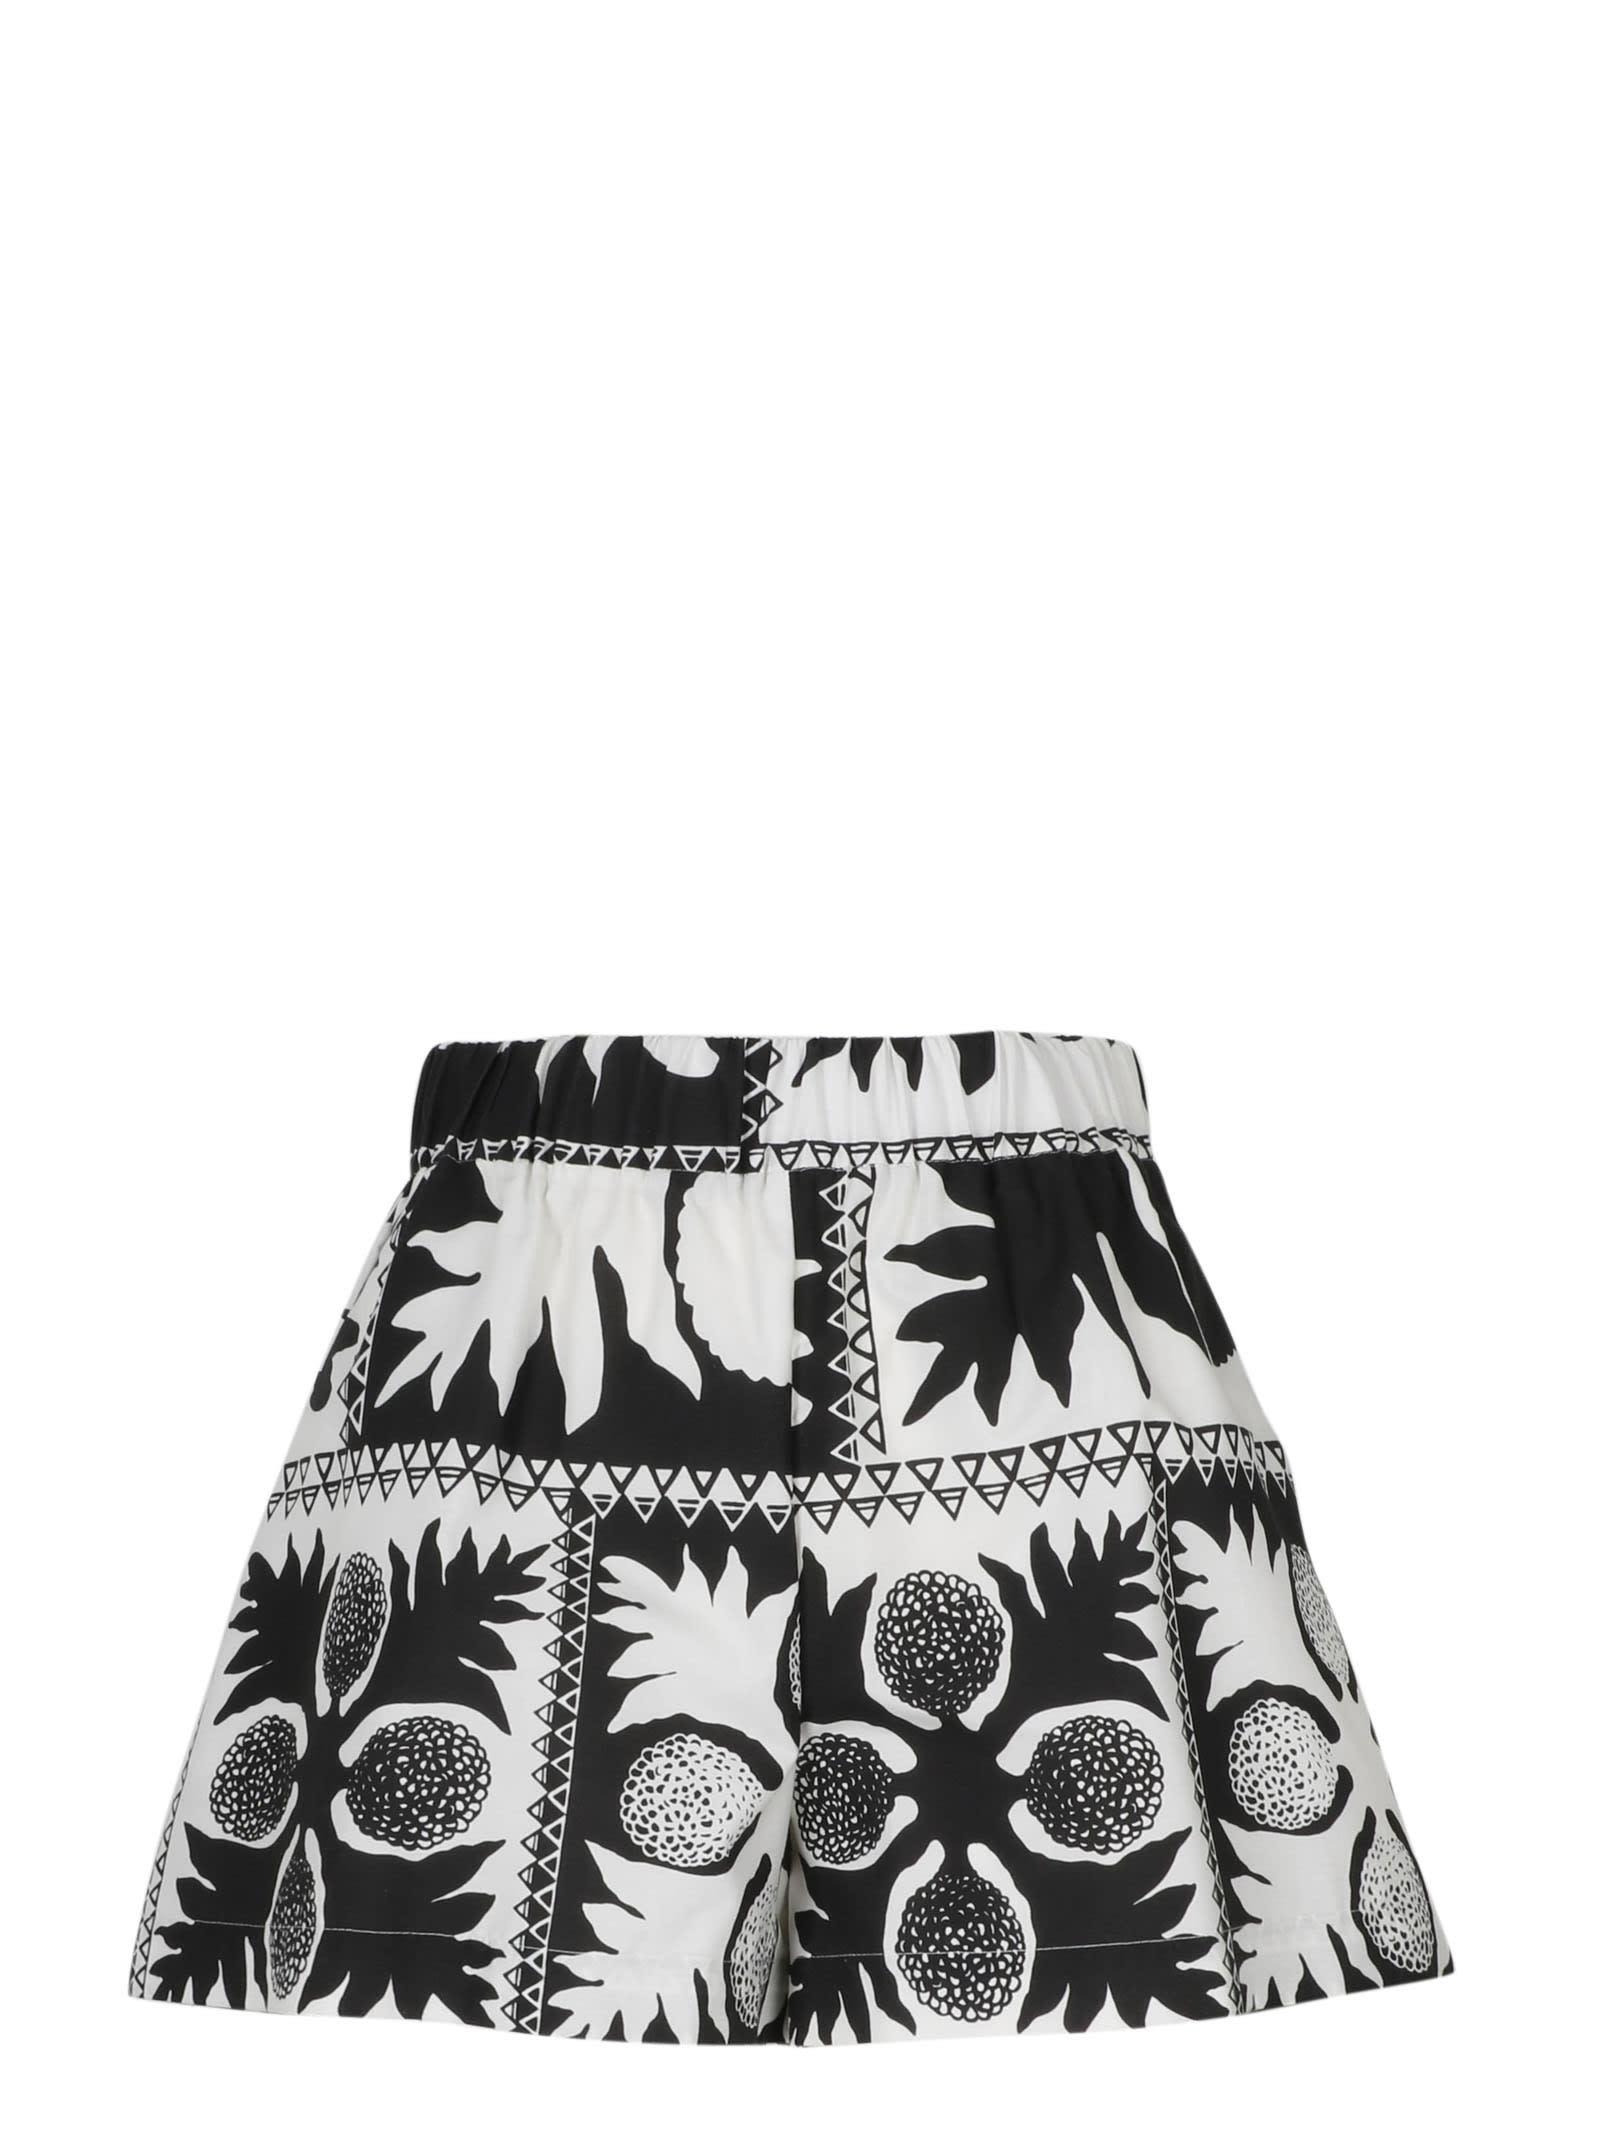 RED Valentino Flower Damier Shorts